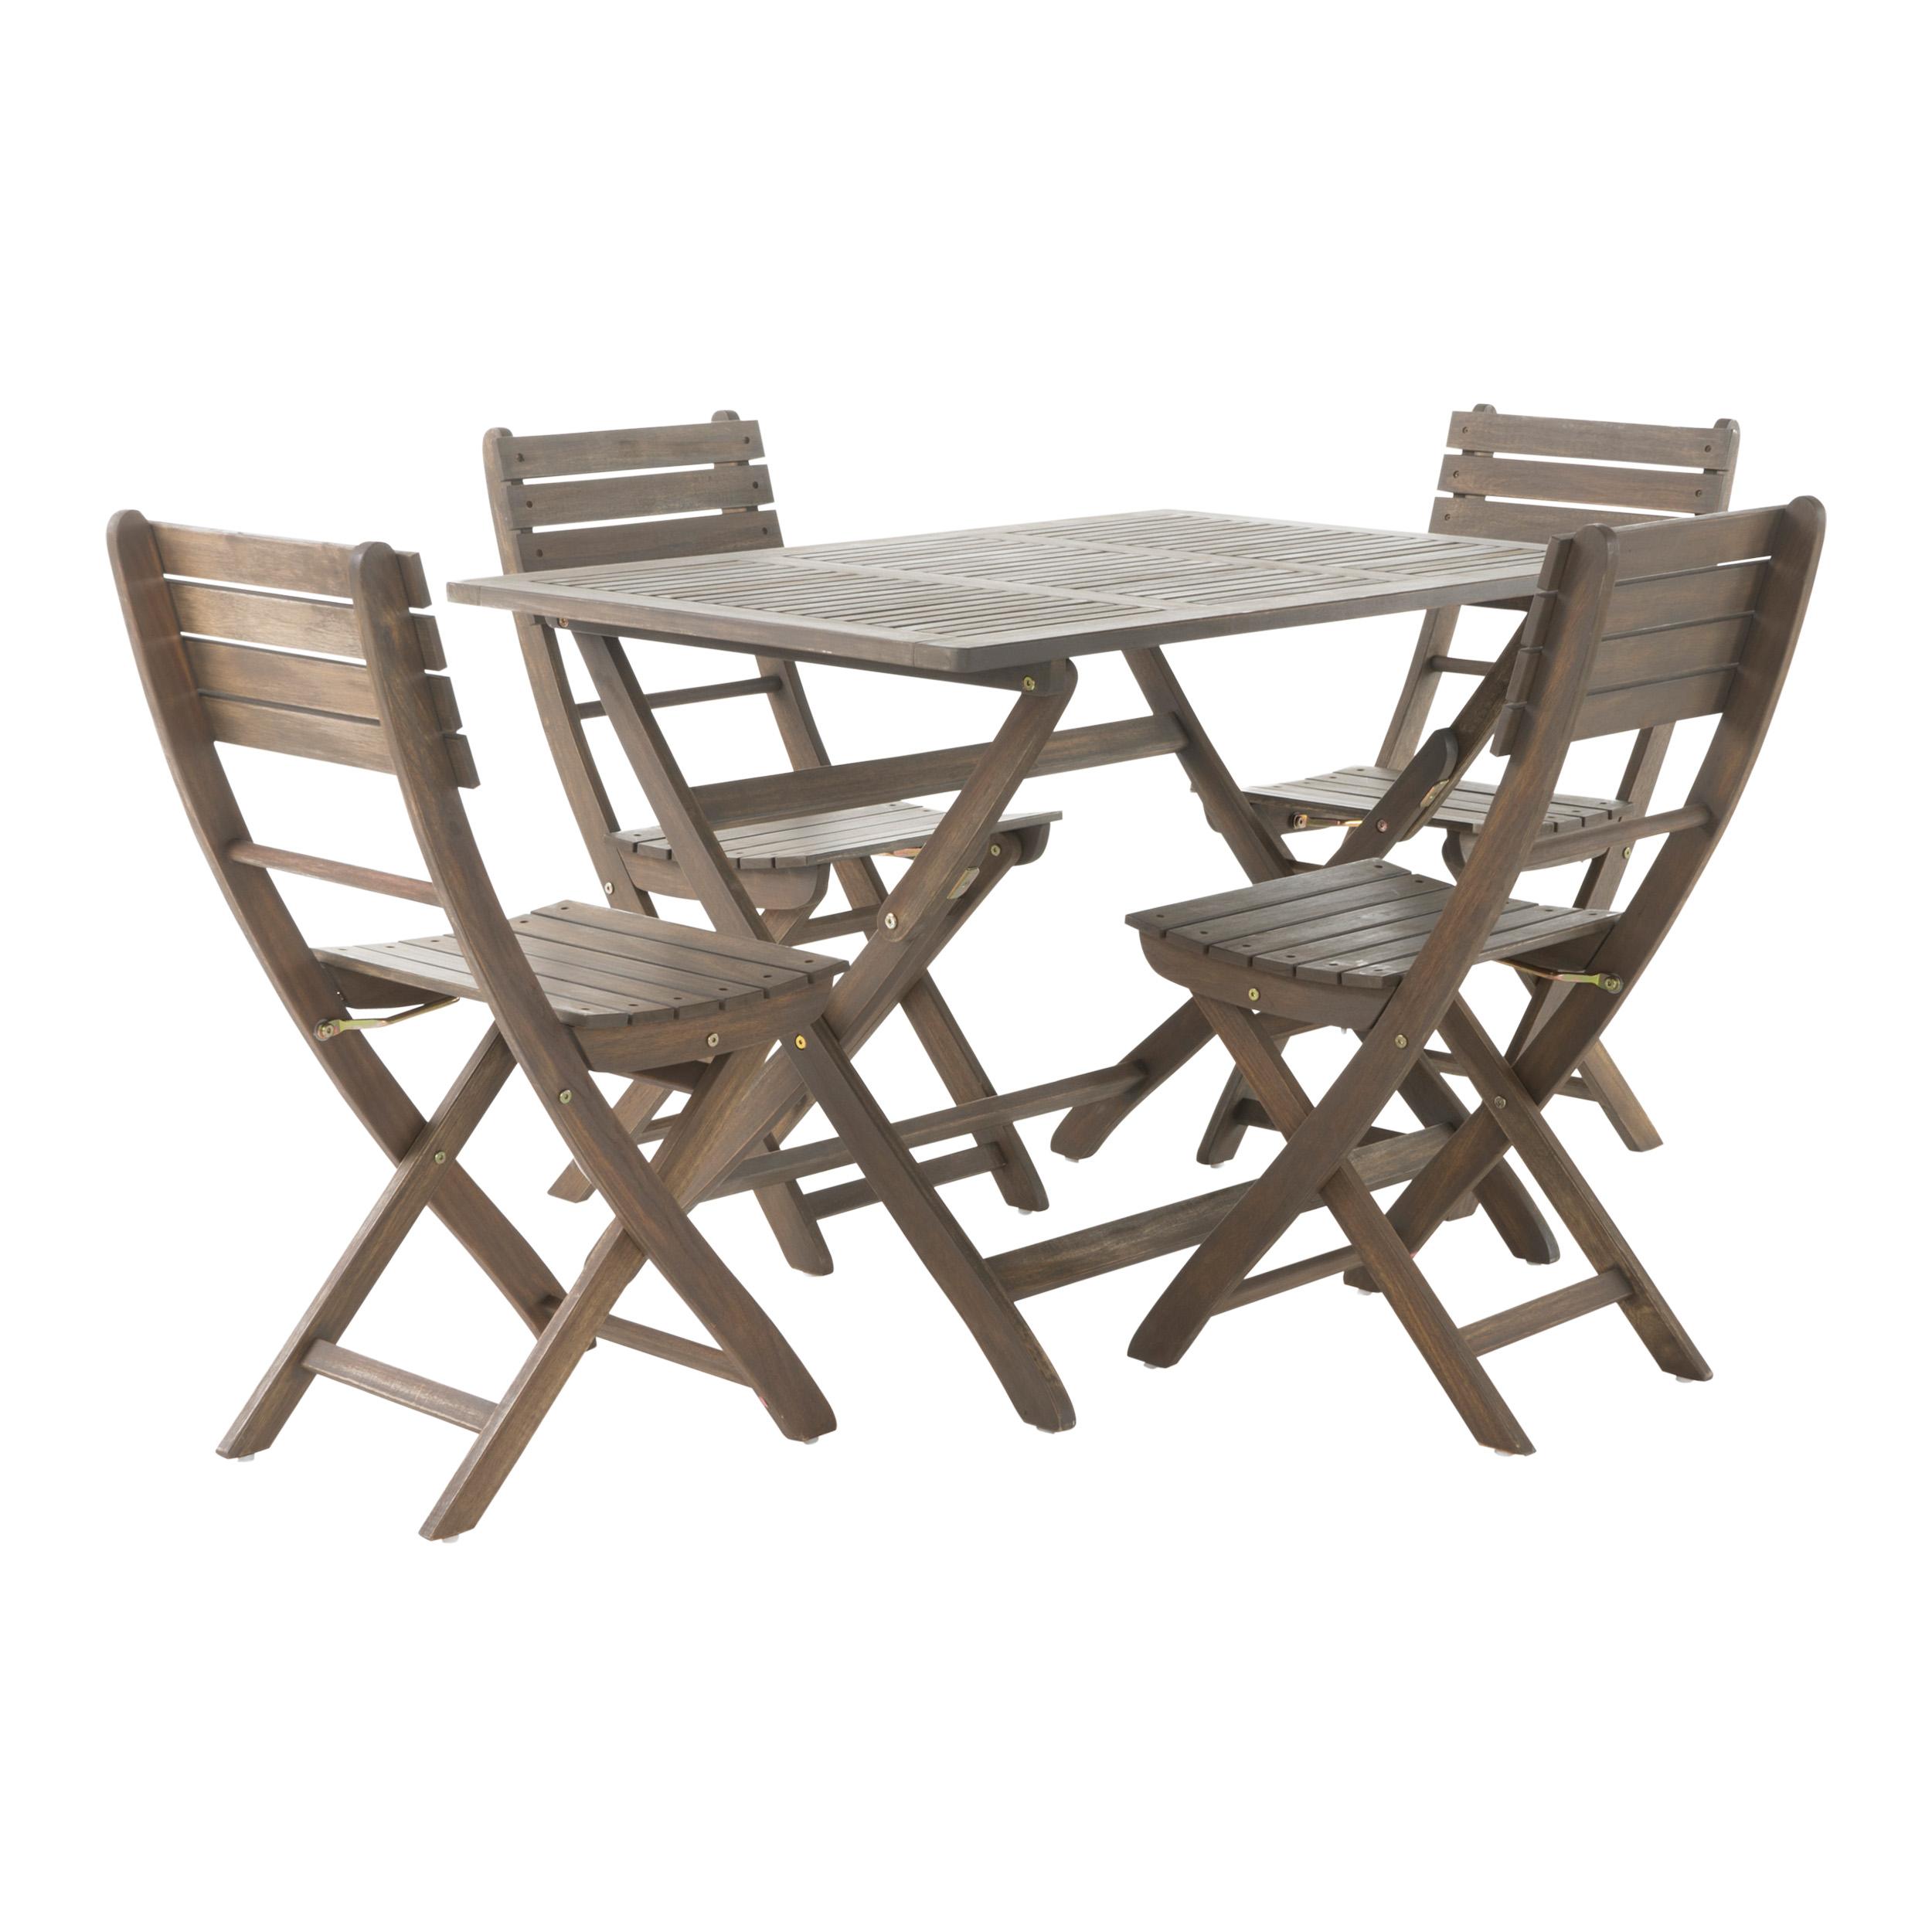 Vicaro Outdoor Acacia Wood Foldable Dining Set, Grey Finish